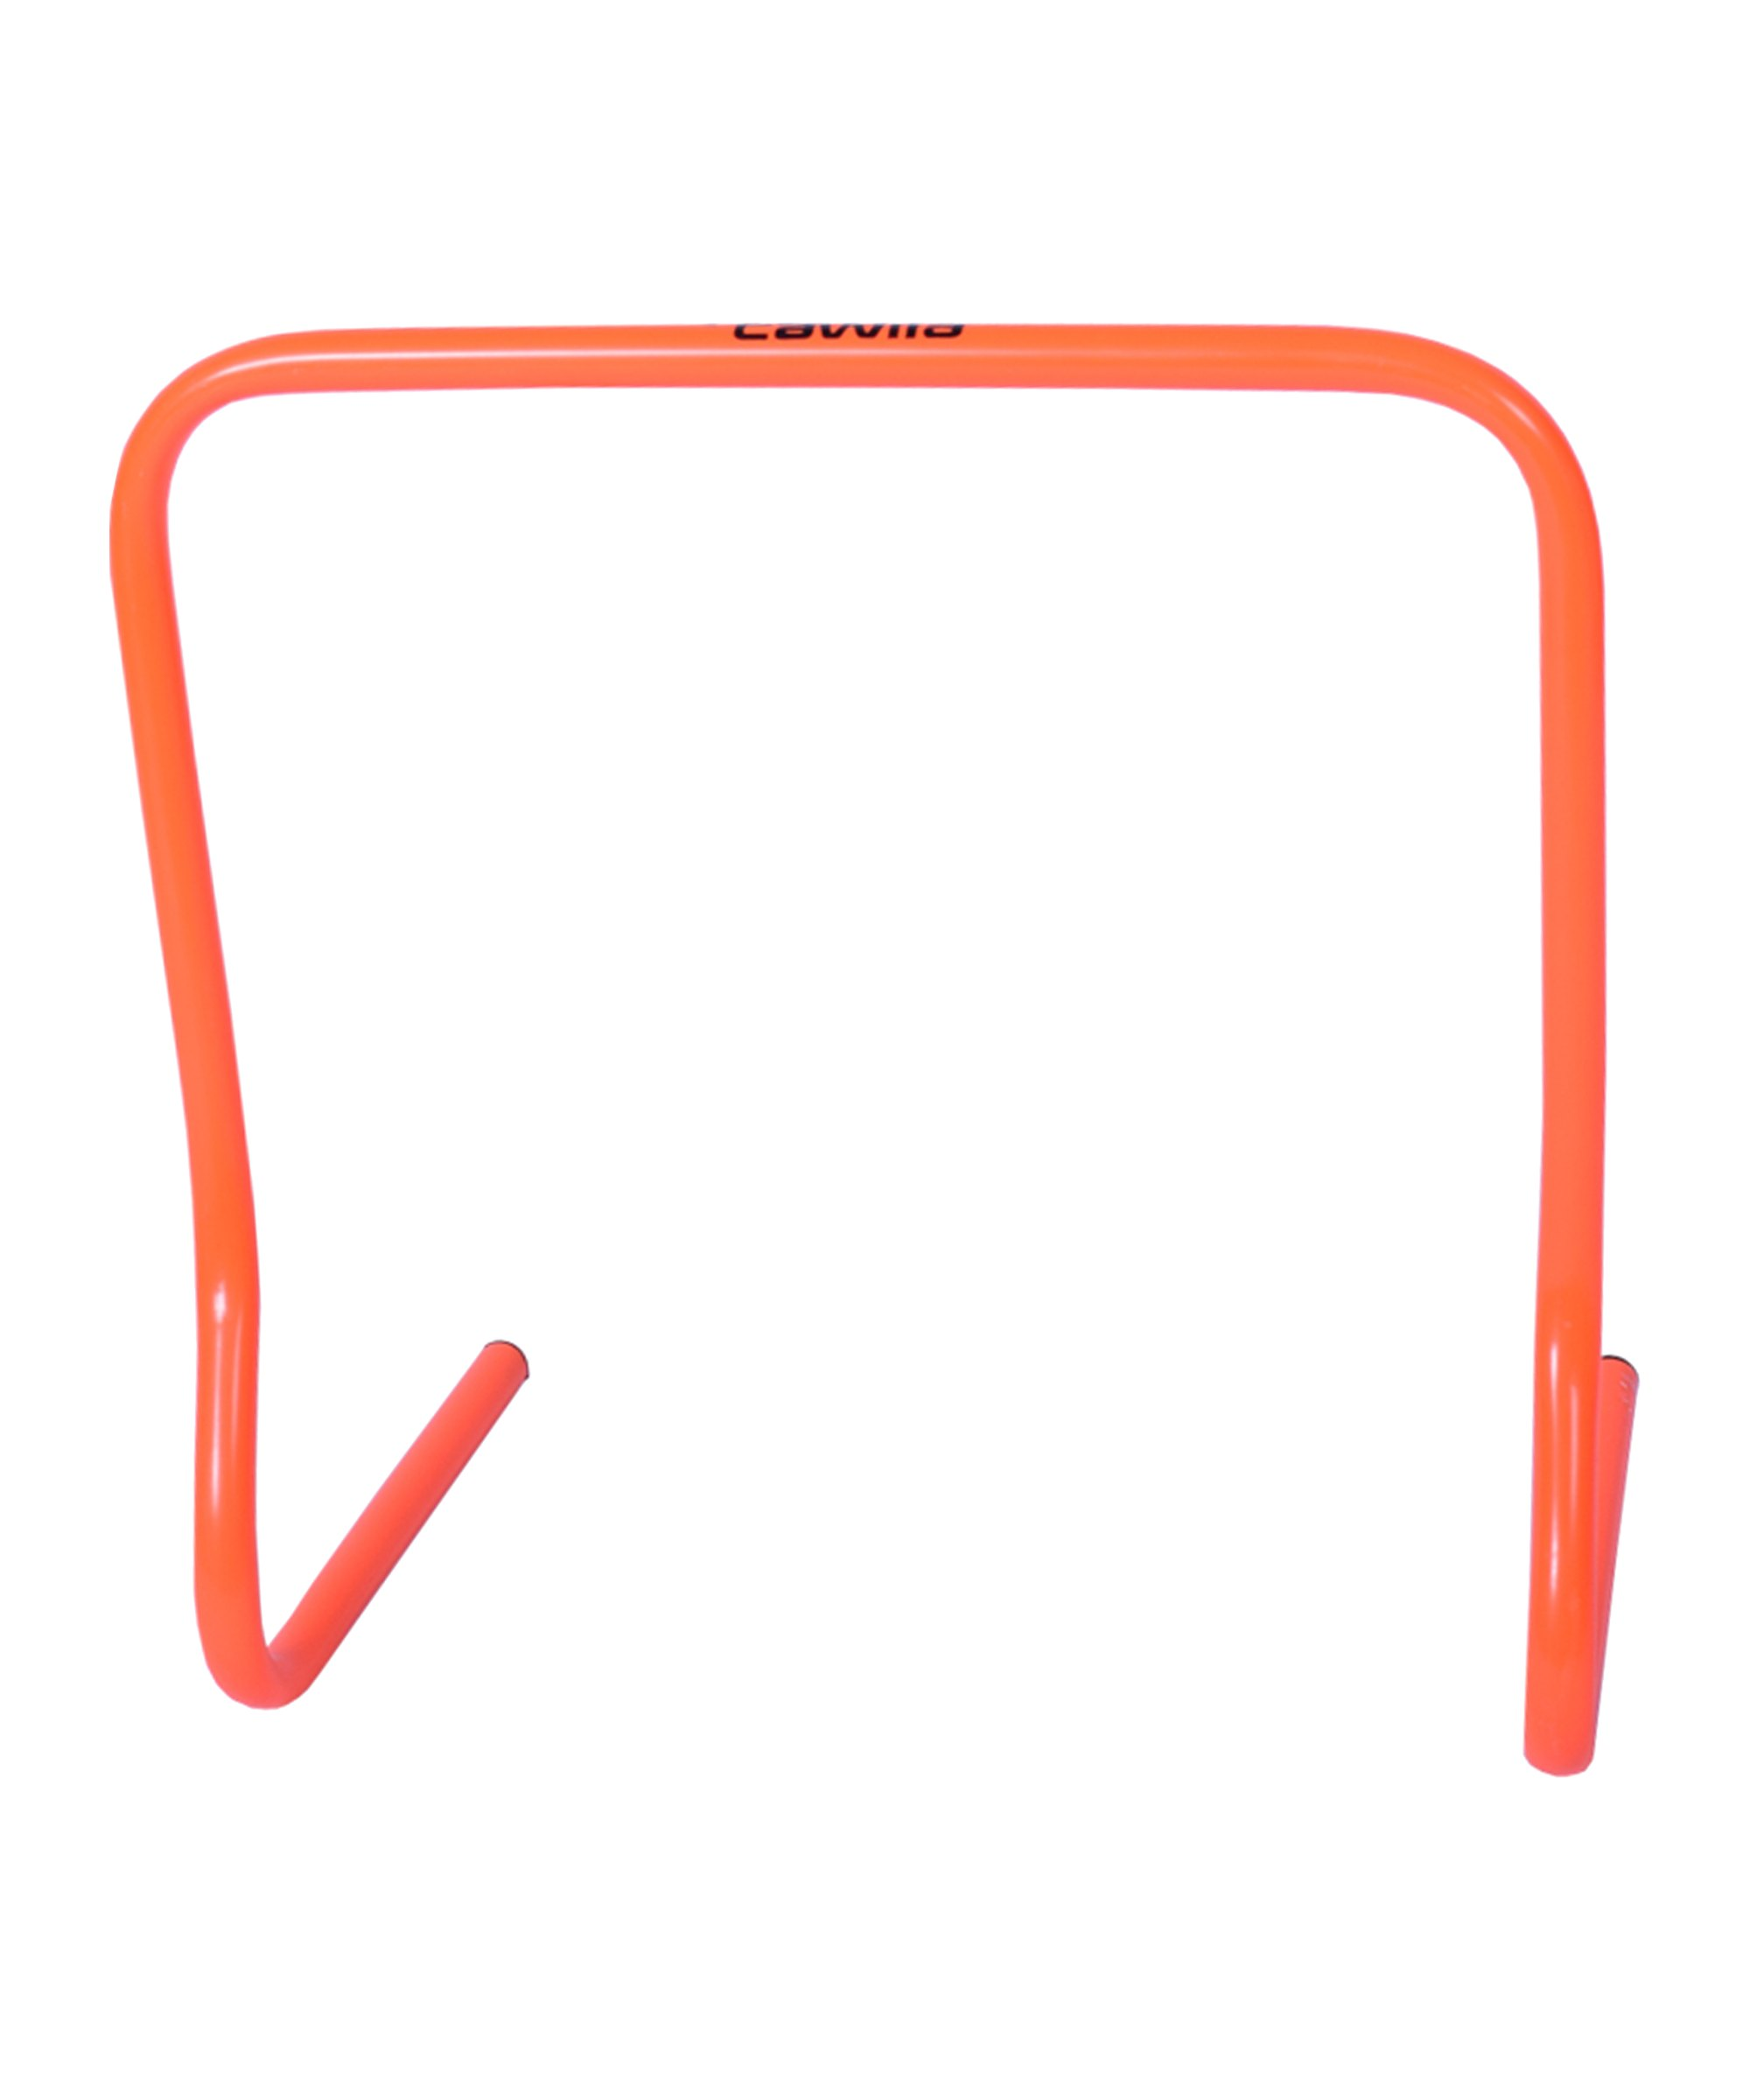 Cawila Mini-Hürde 45cm Orange - orange